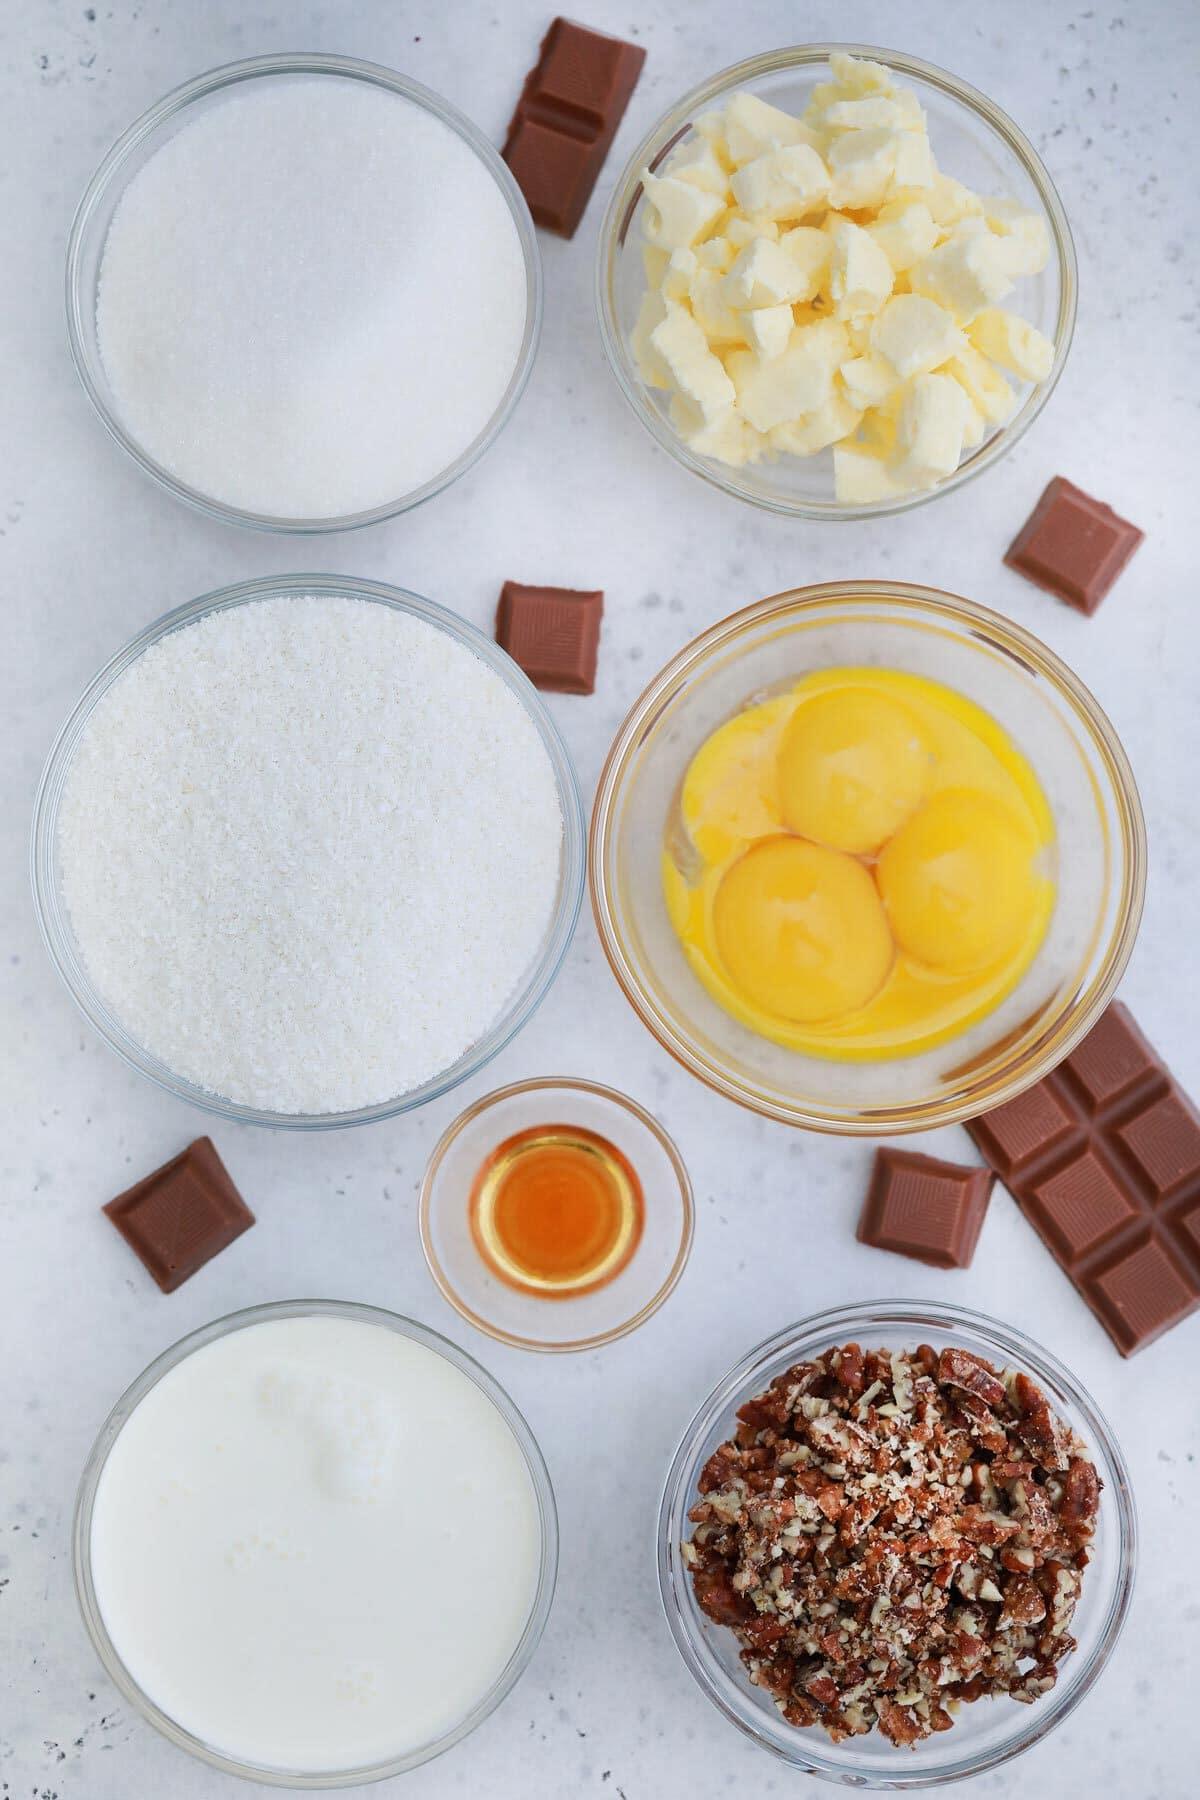 Ingredients for coconut pecan frosting